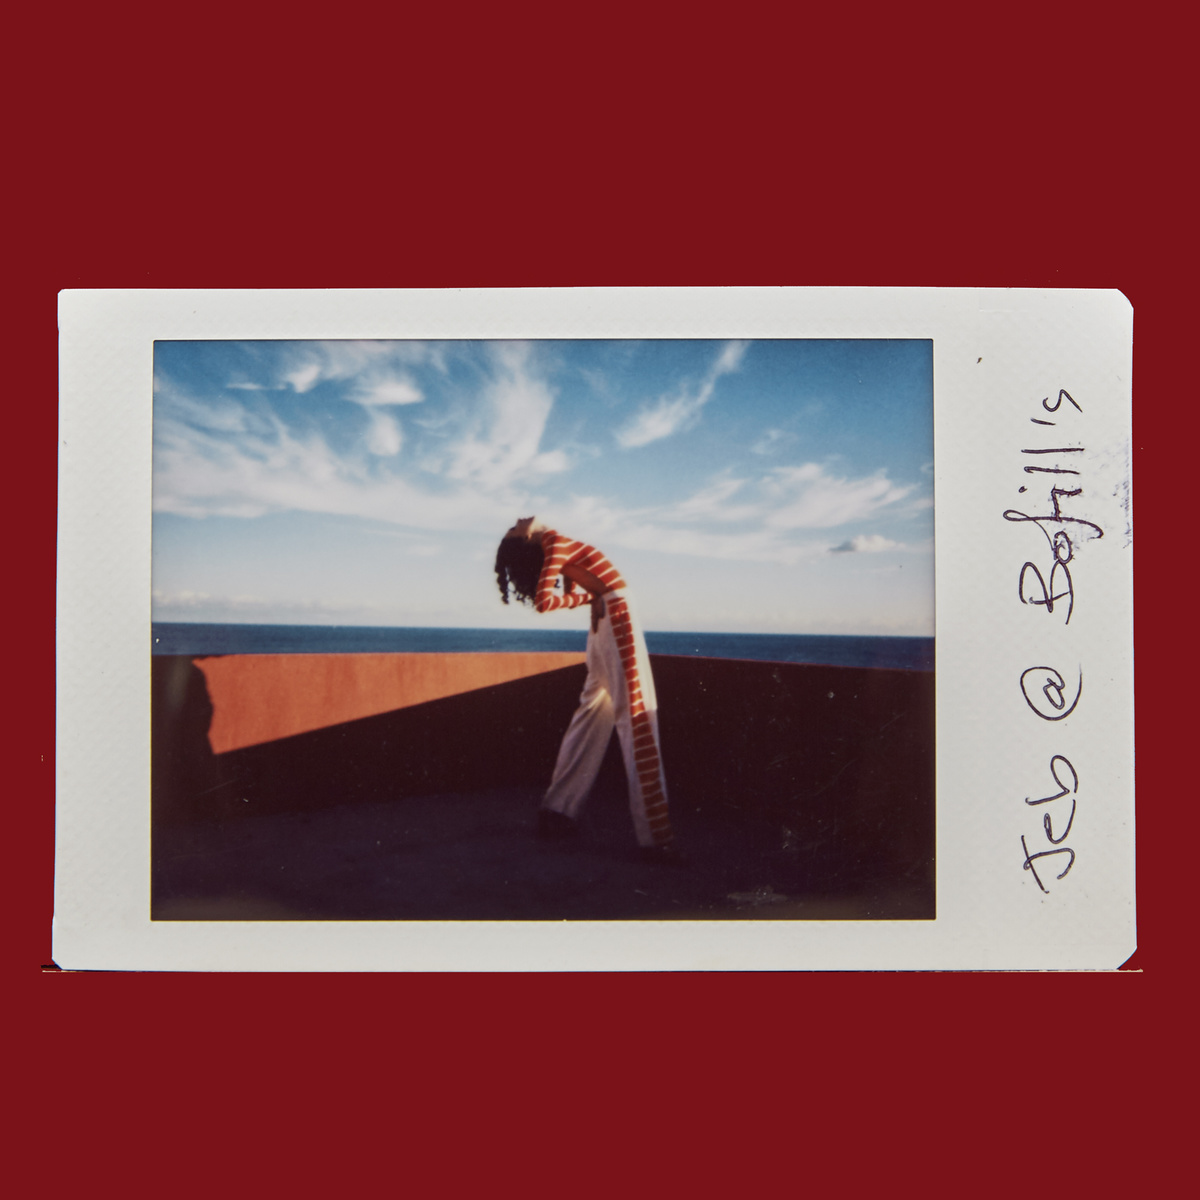 Polaroid by photographer Amanda Fordyce